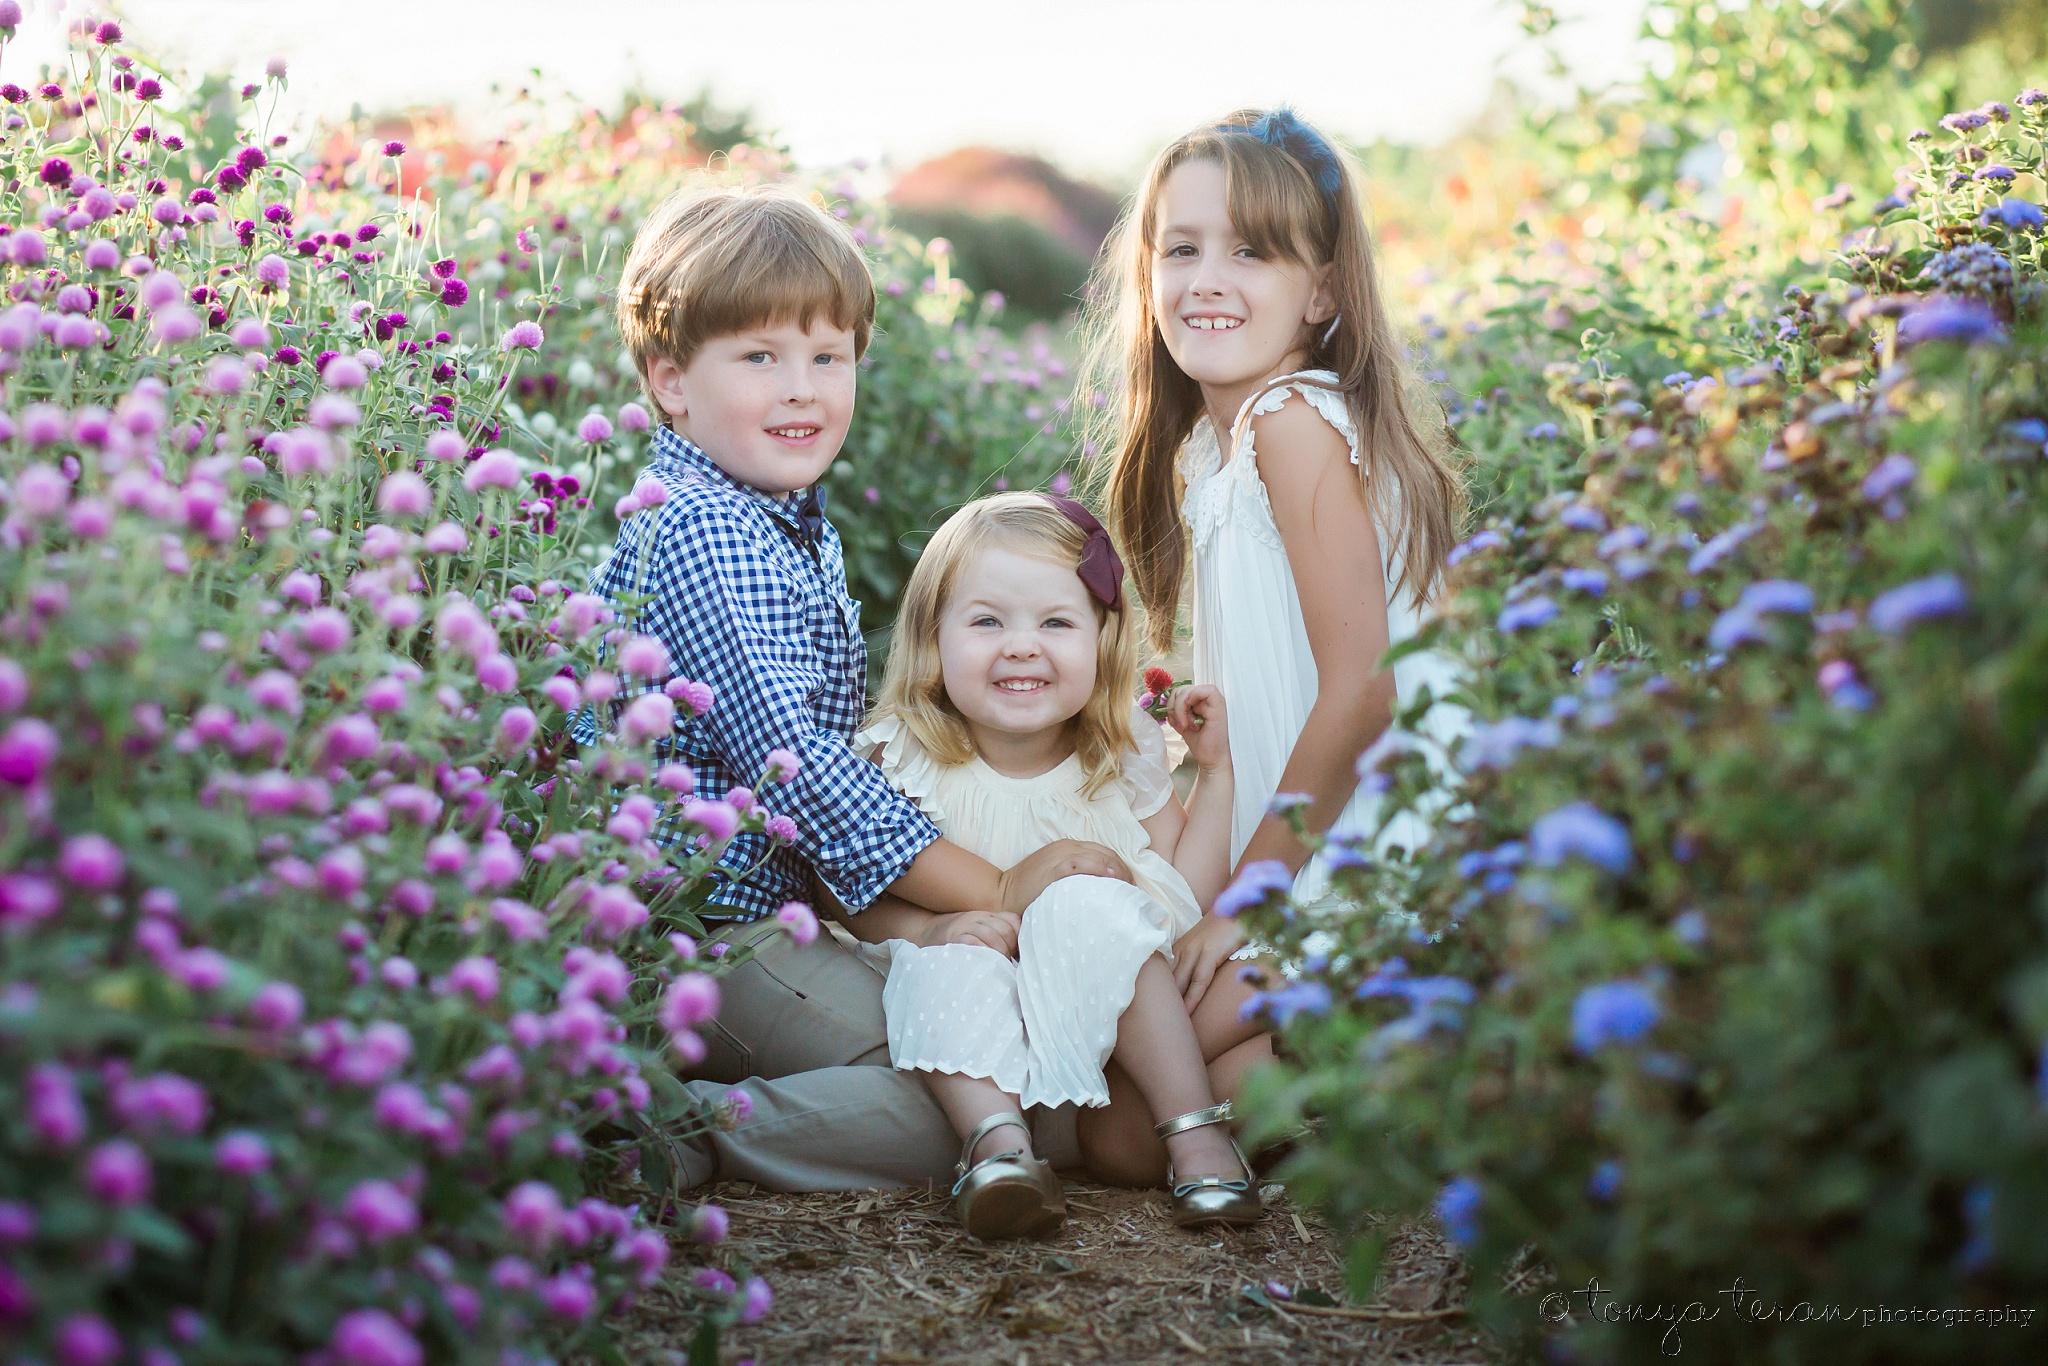 Outdoor Fall Family Photo Session | Tonya Teran Photography, Bethesda, MD Newborn, Baby, and Family Photographer